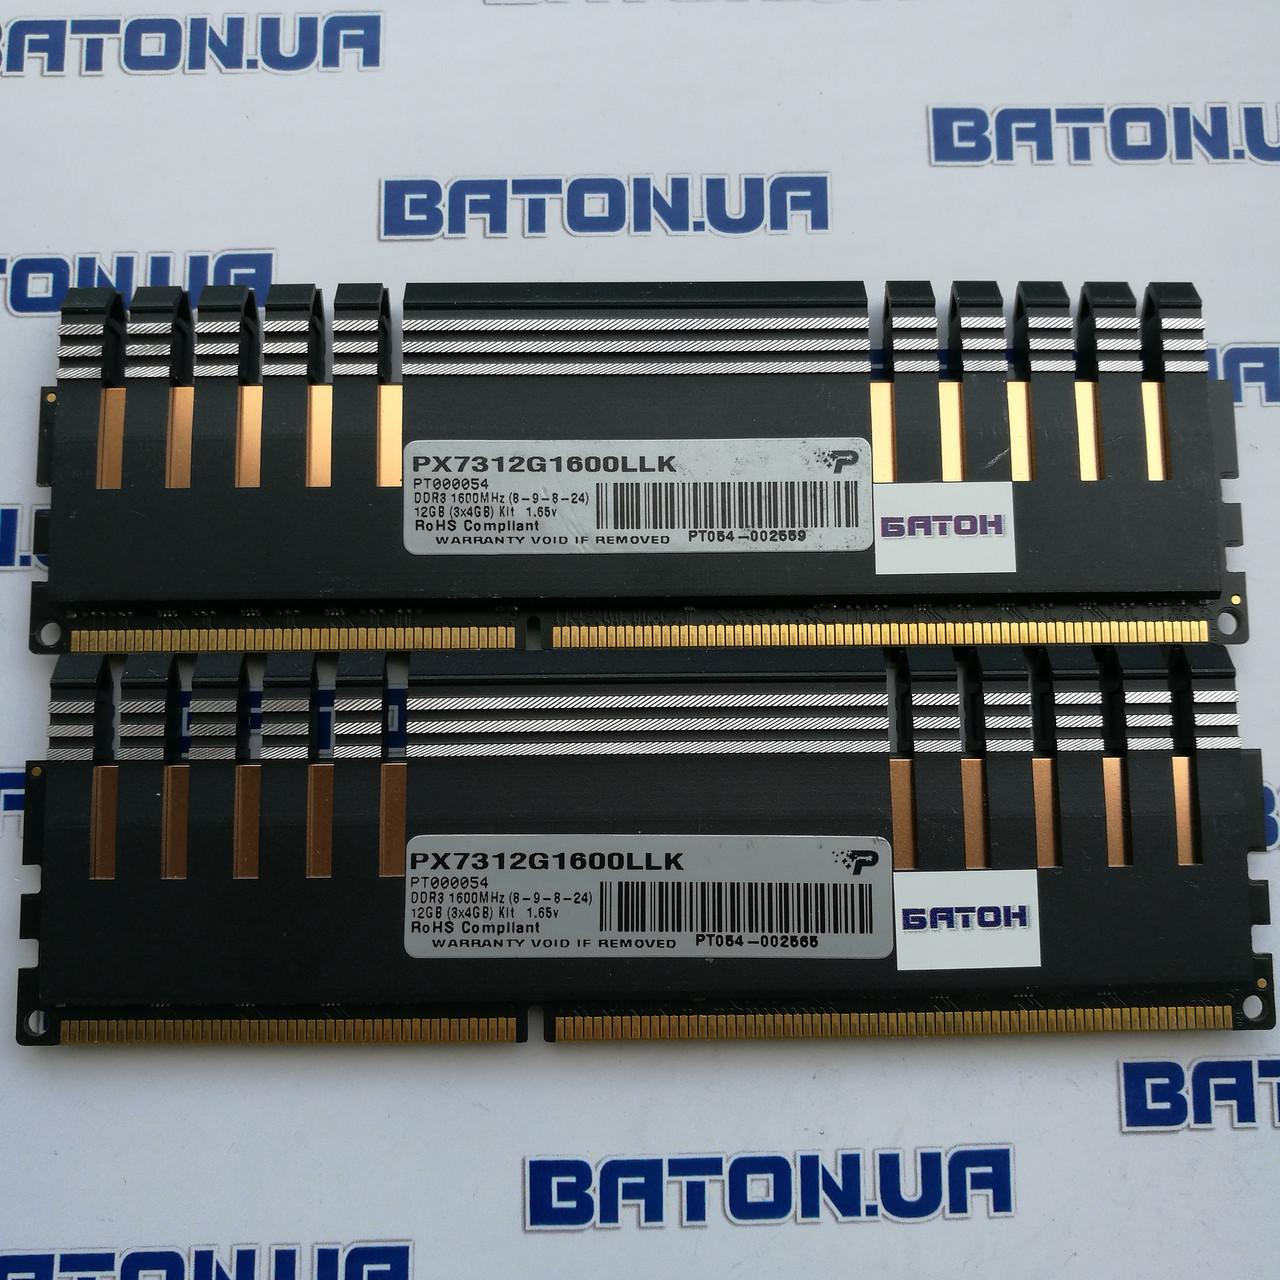 Игровая оперативная память Patriot Viper DDR3 8Gb 1600MHz PC3 12800U CL8 (PX7312G1600LLK)